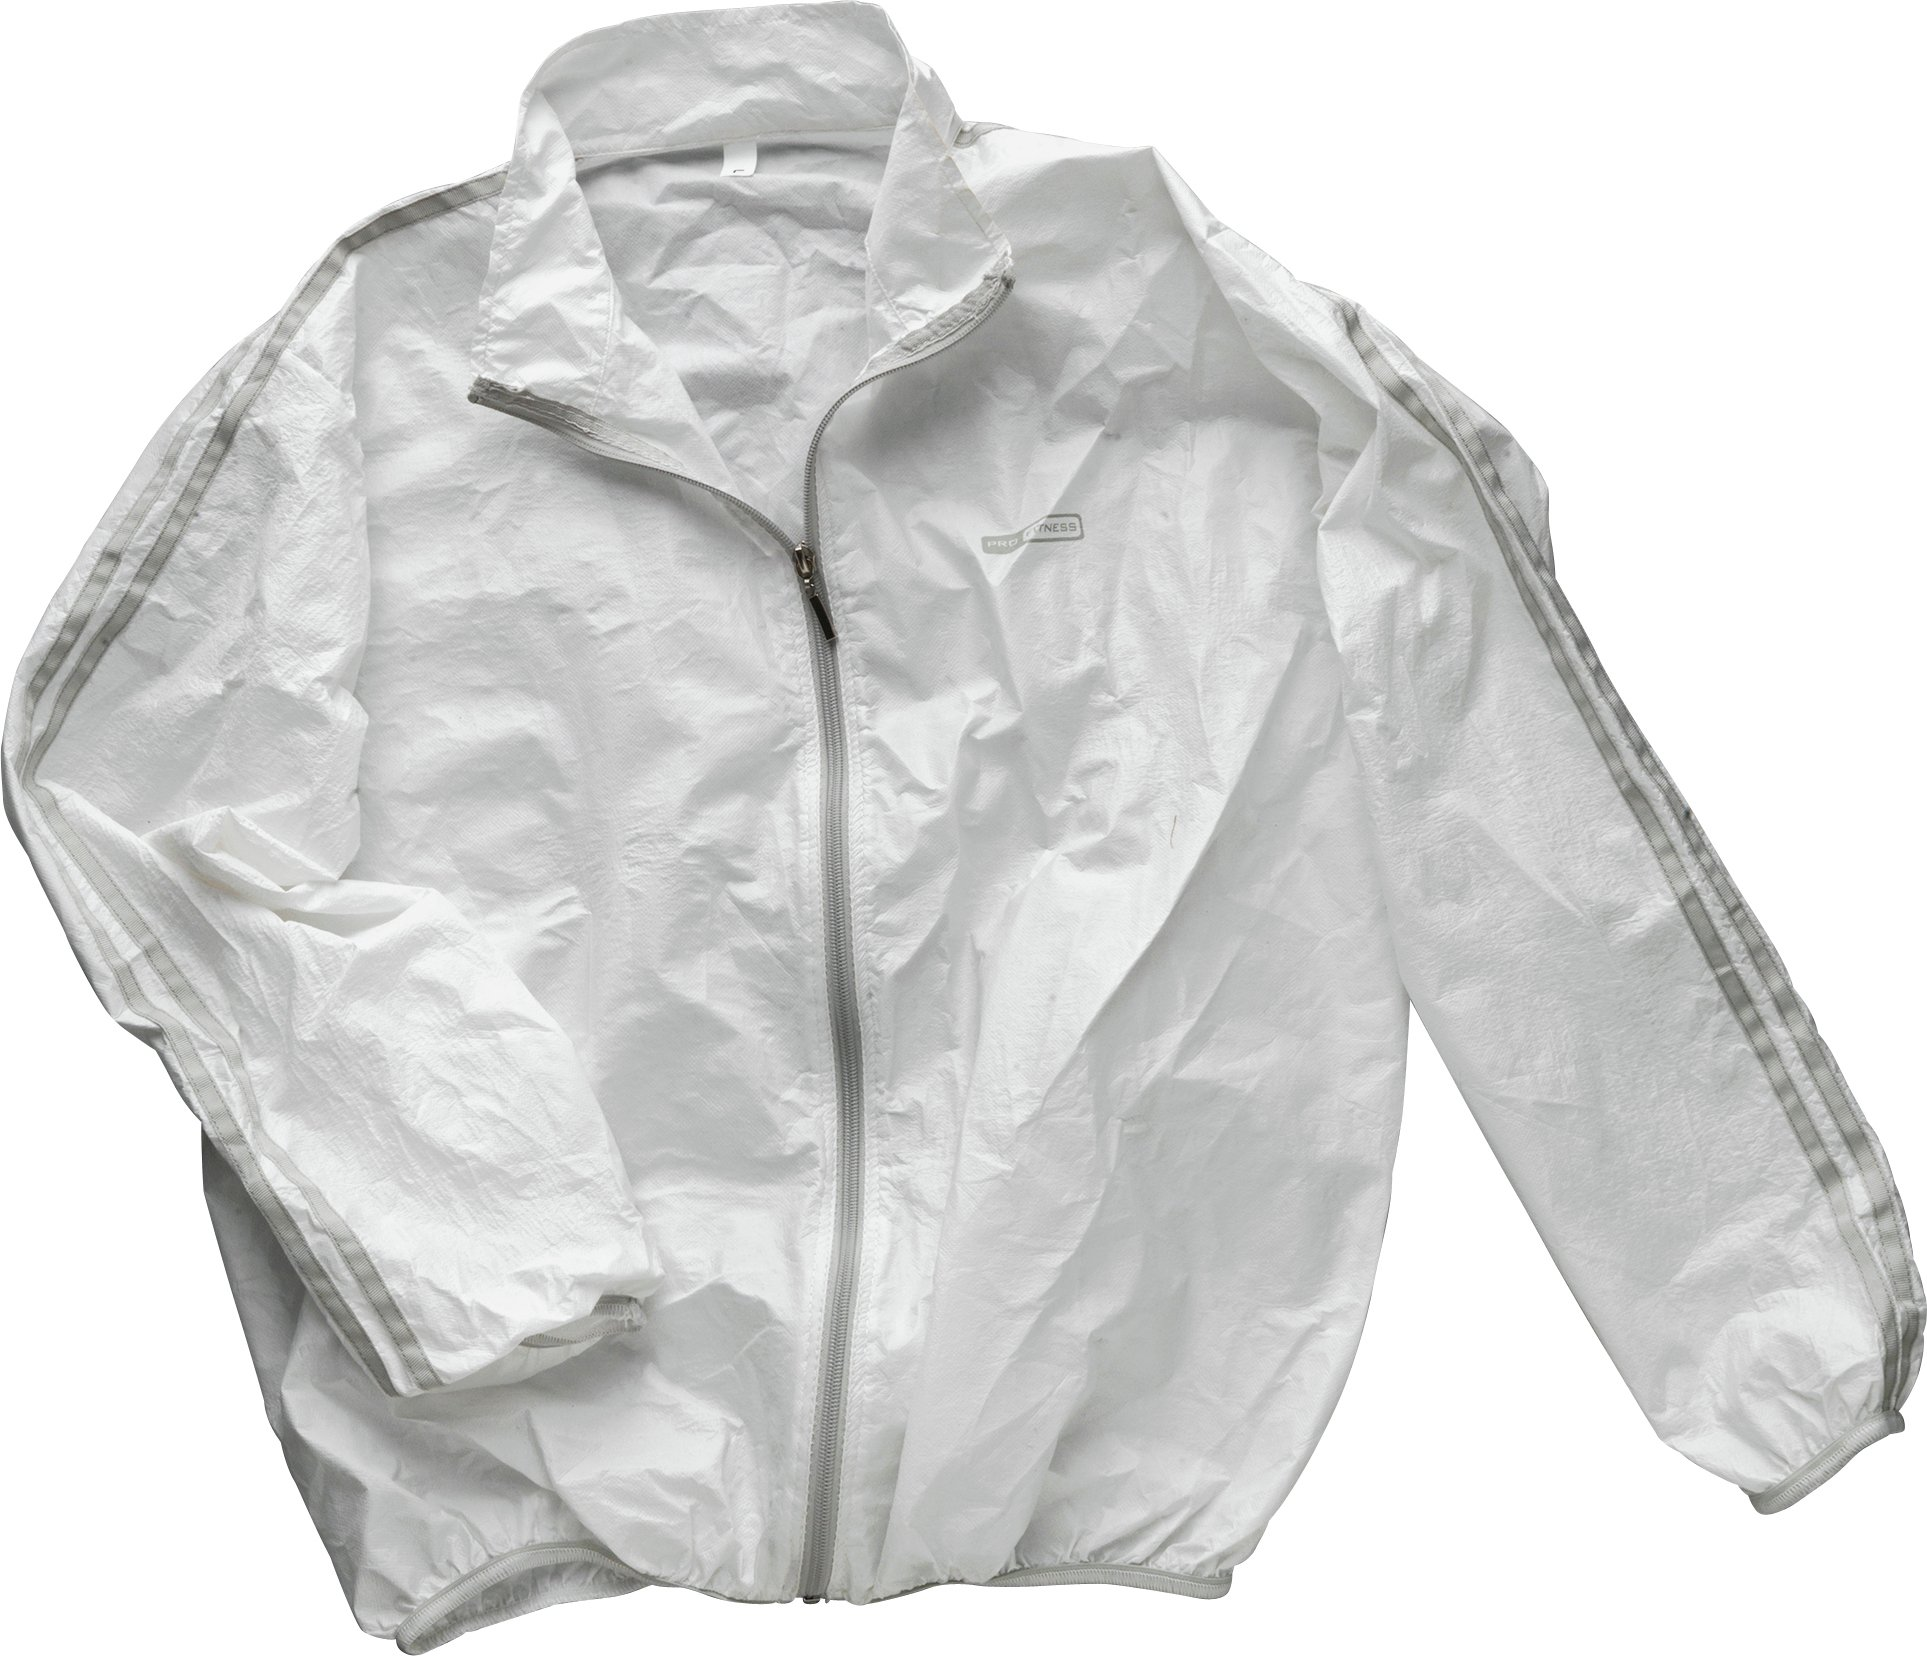 Pro Fitness - Unisex Sauna Suit